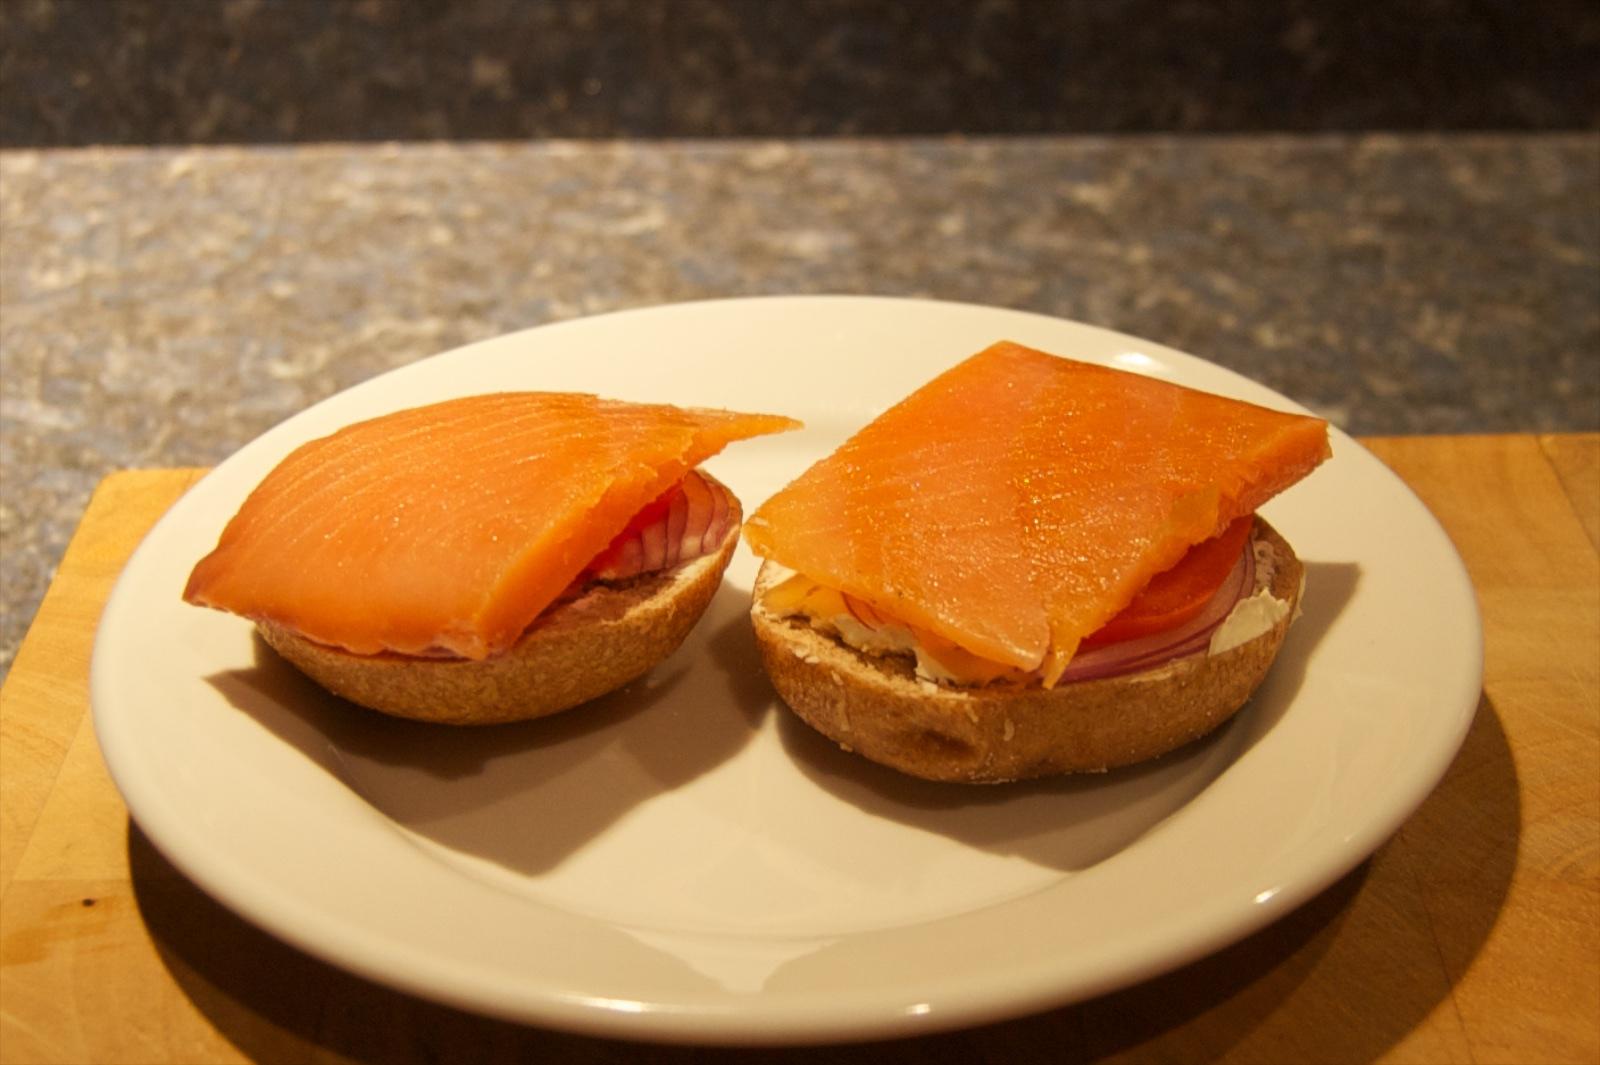 http://blog.rickk.com/food/2015/03/22/ate.2015.03.22.b.jpg